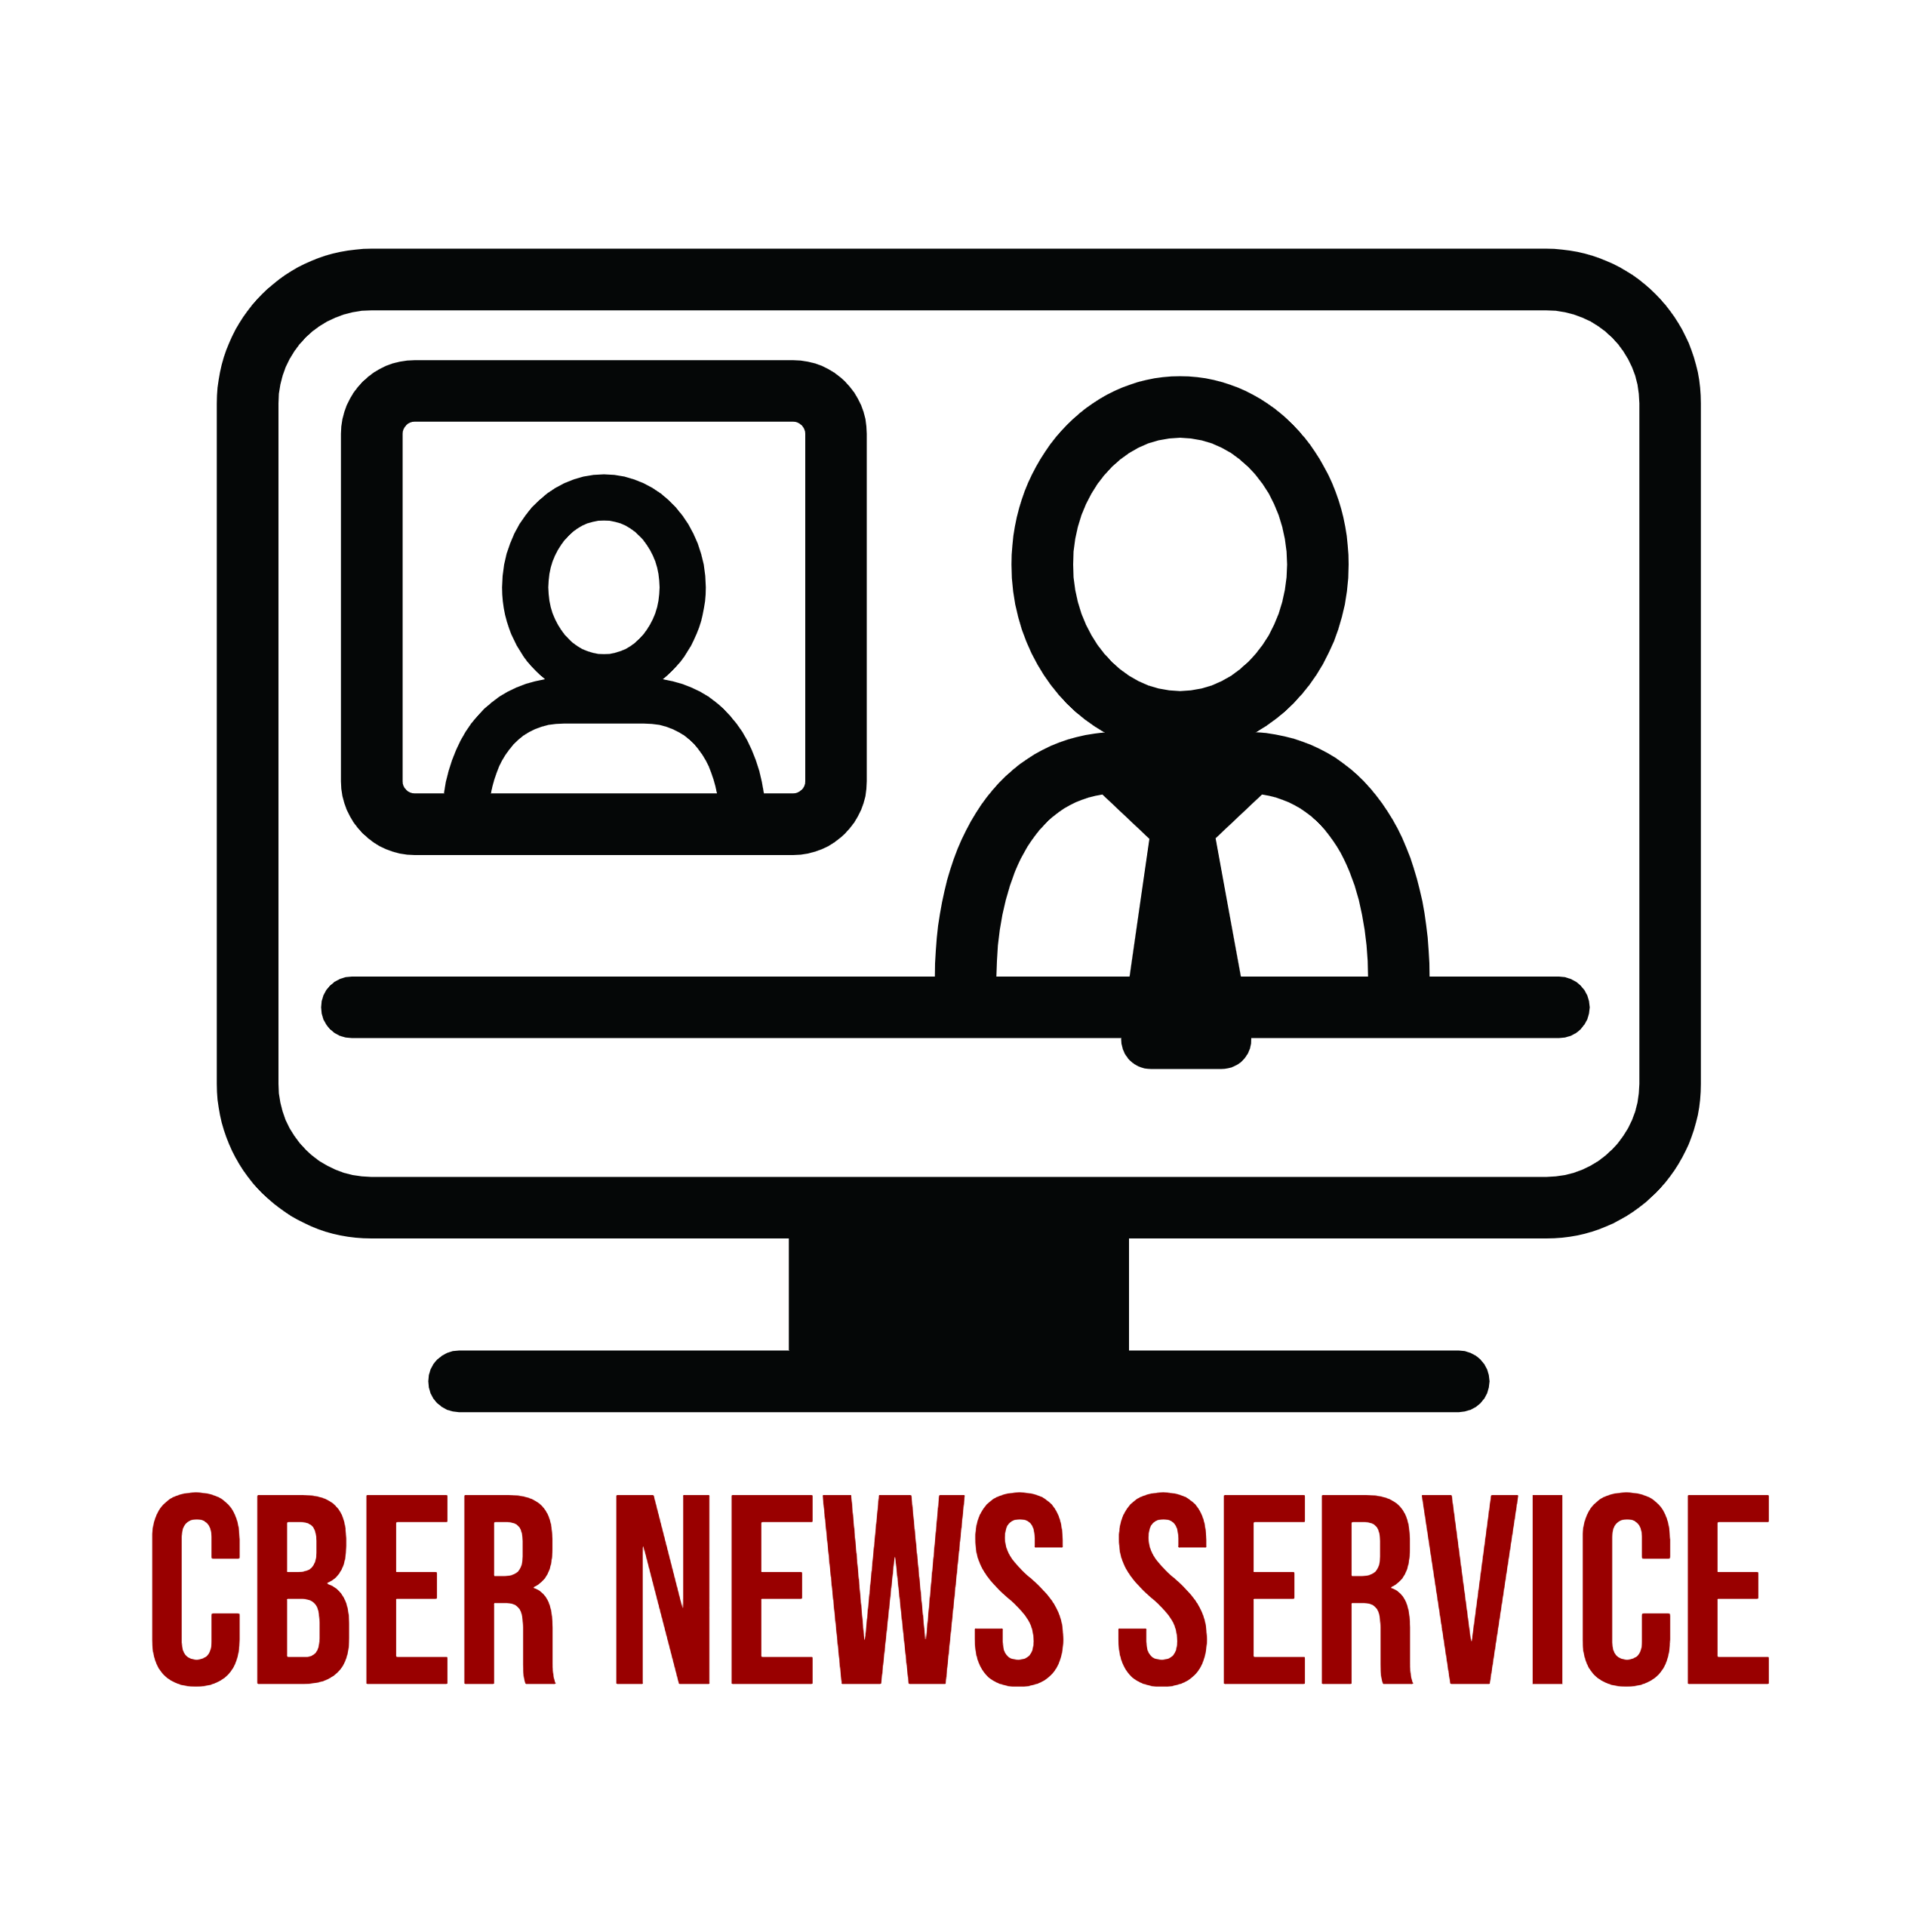 CBER news service